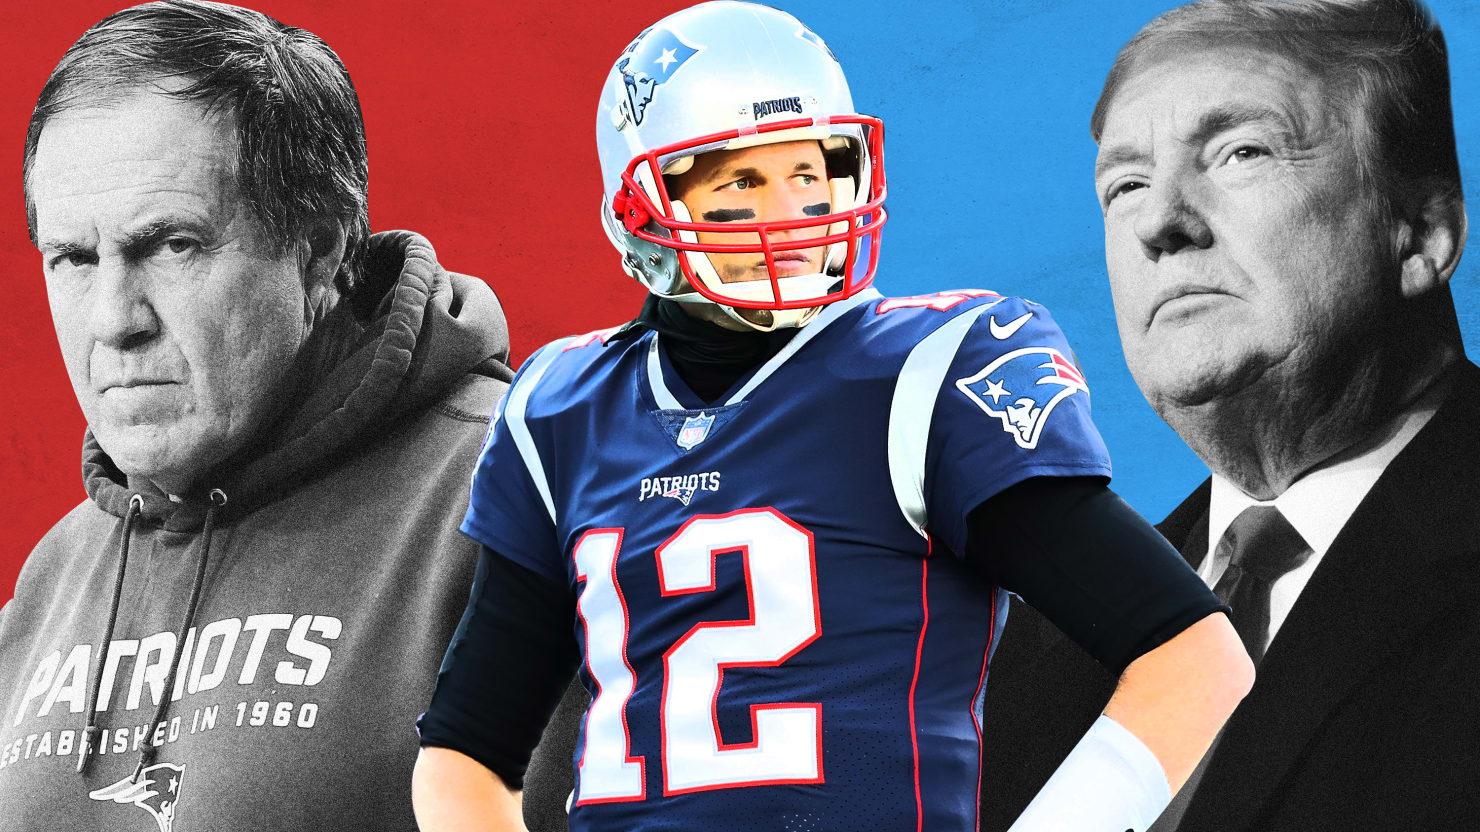 Tom Brady And The New England Patriots Trump Mentality